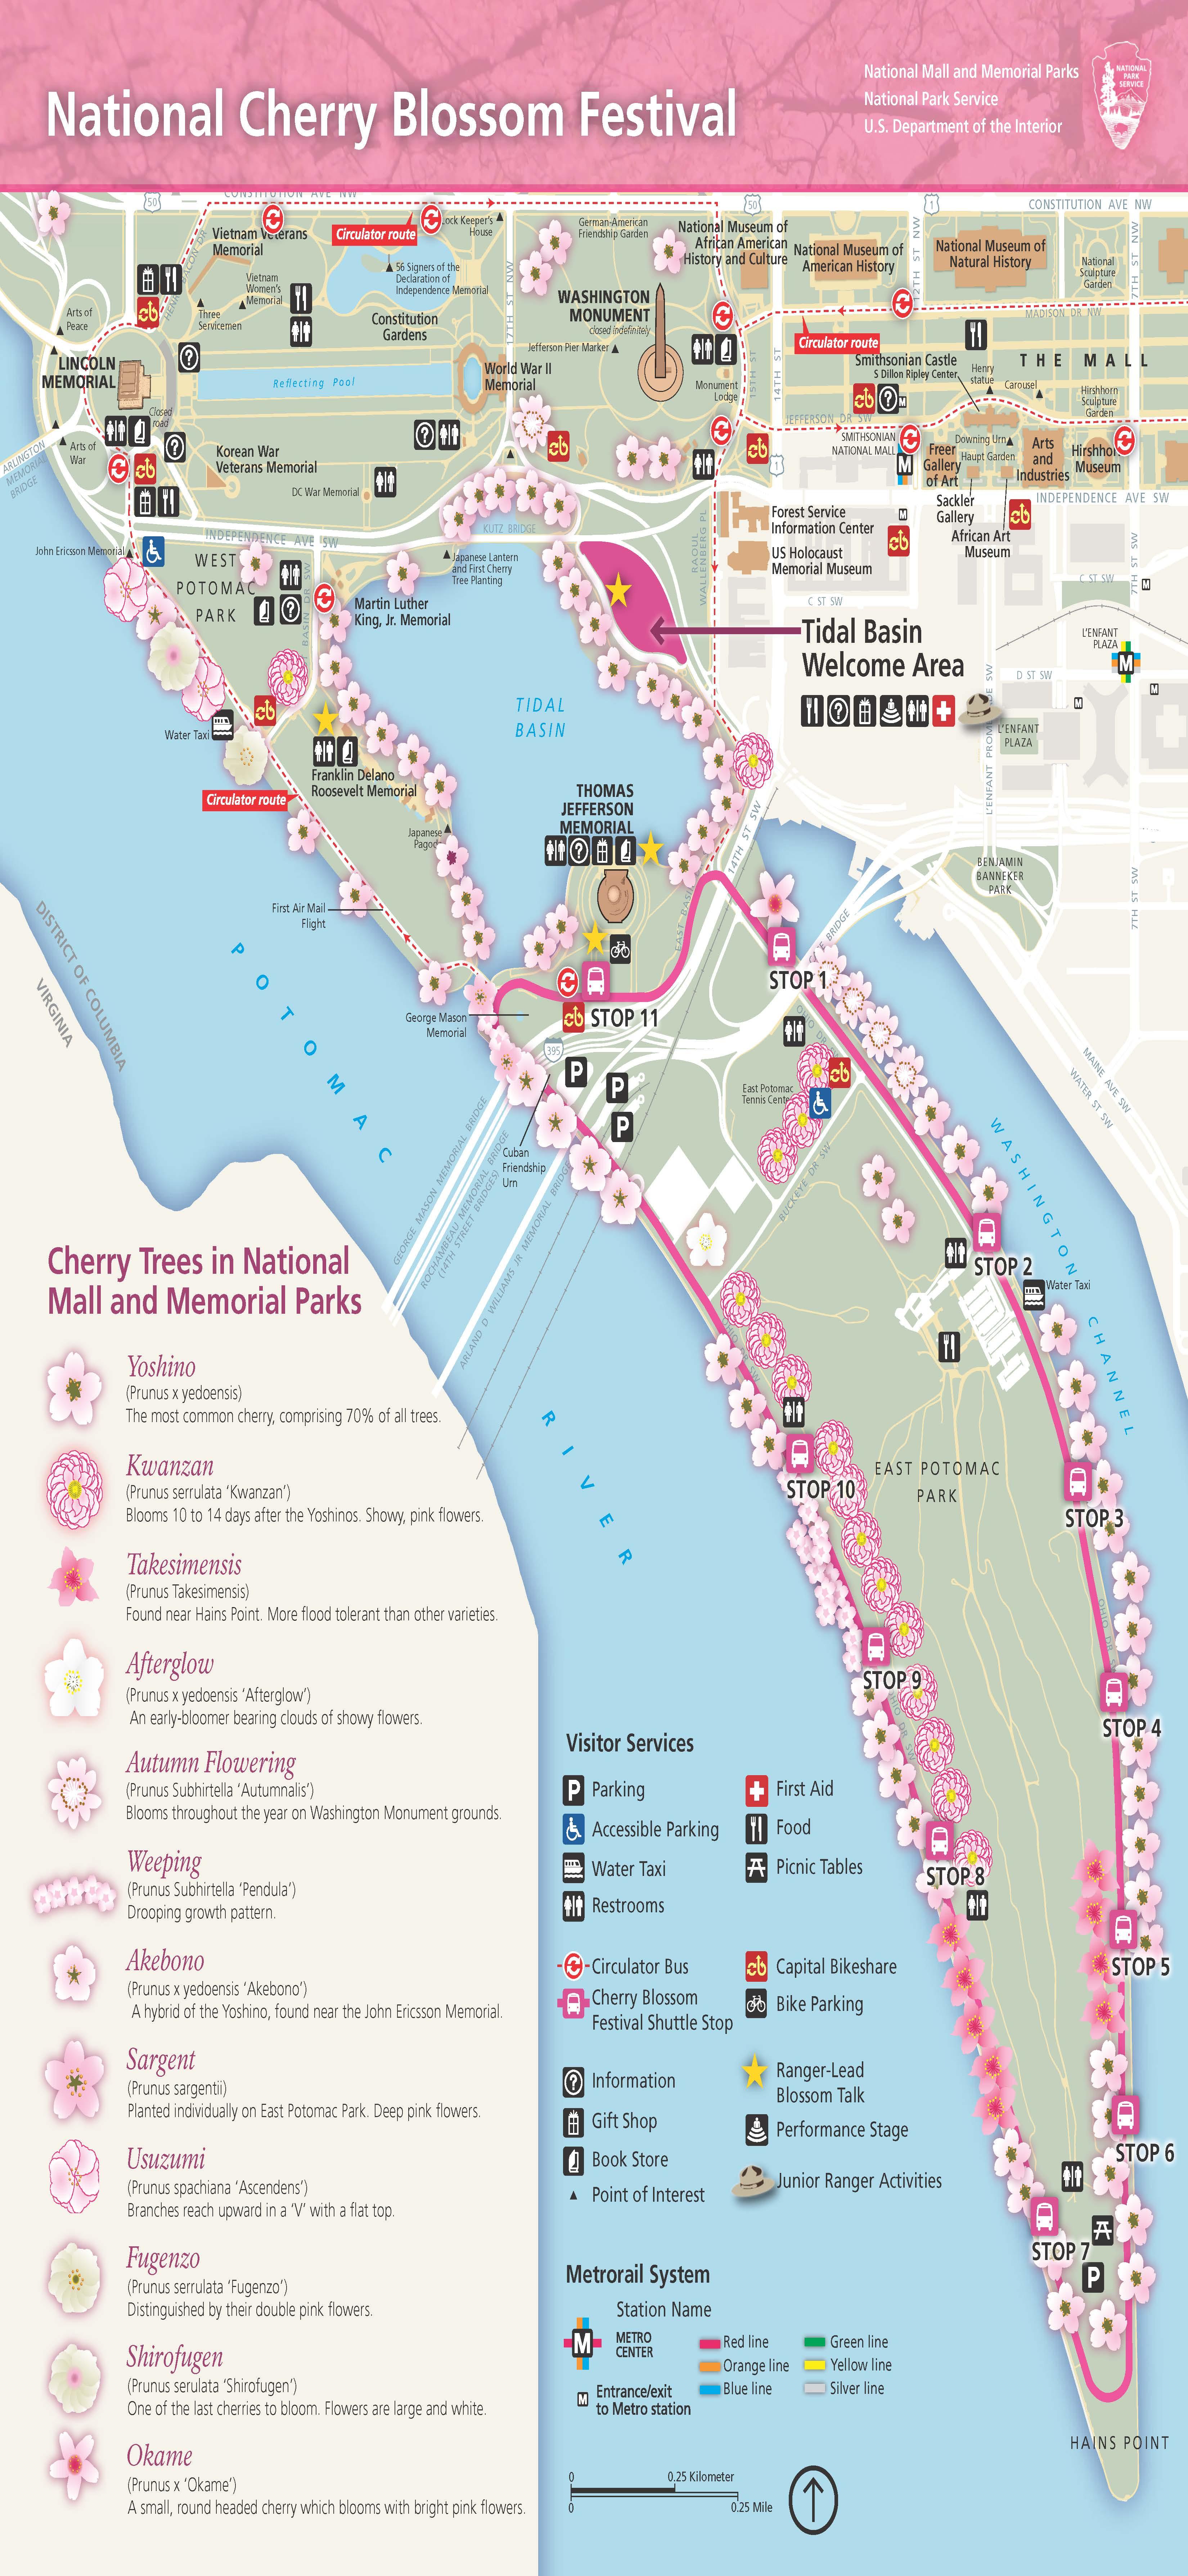 Maps - Cherry Blossom Festival (U.S. National Park Service)